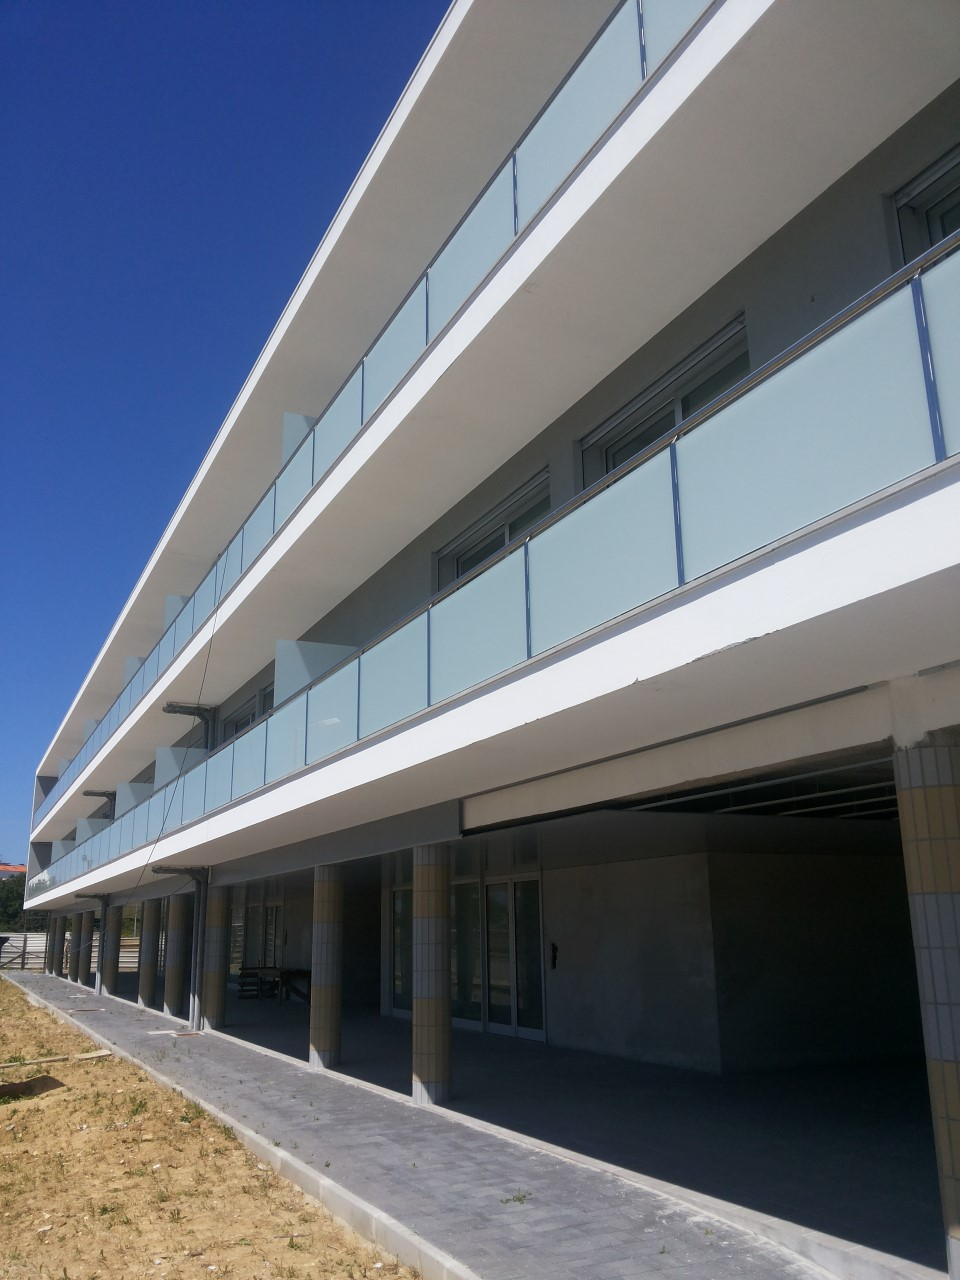 Residential Buildings Pessegueiros